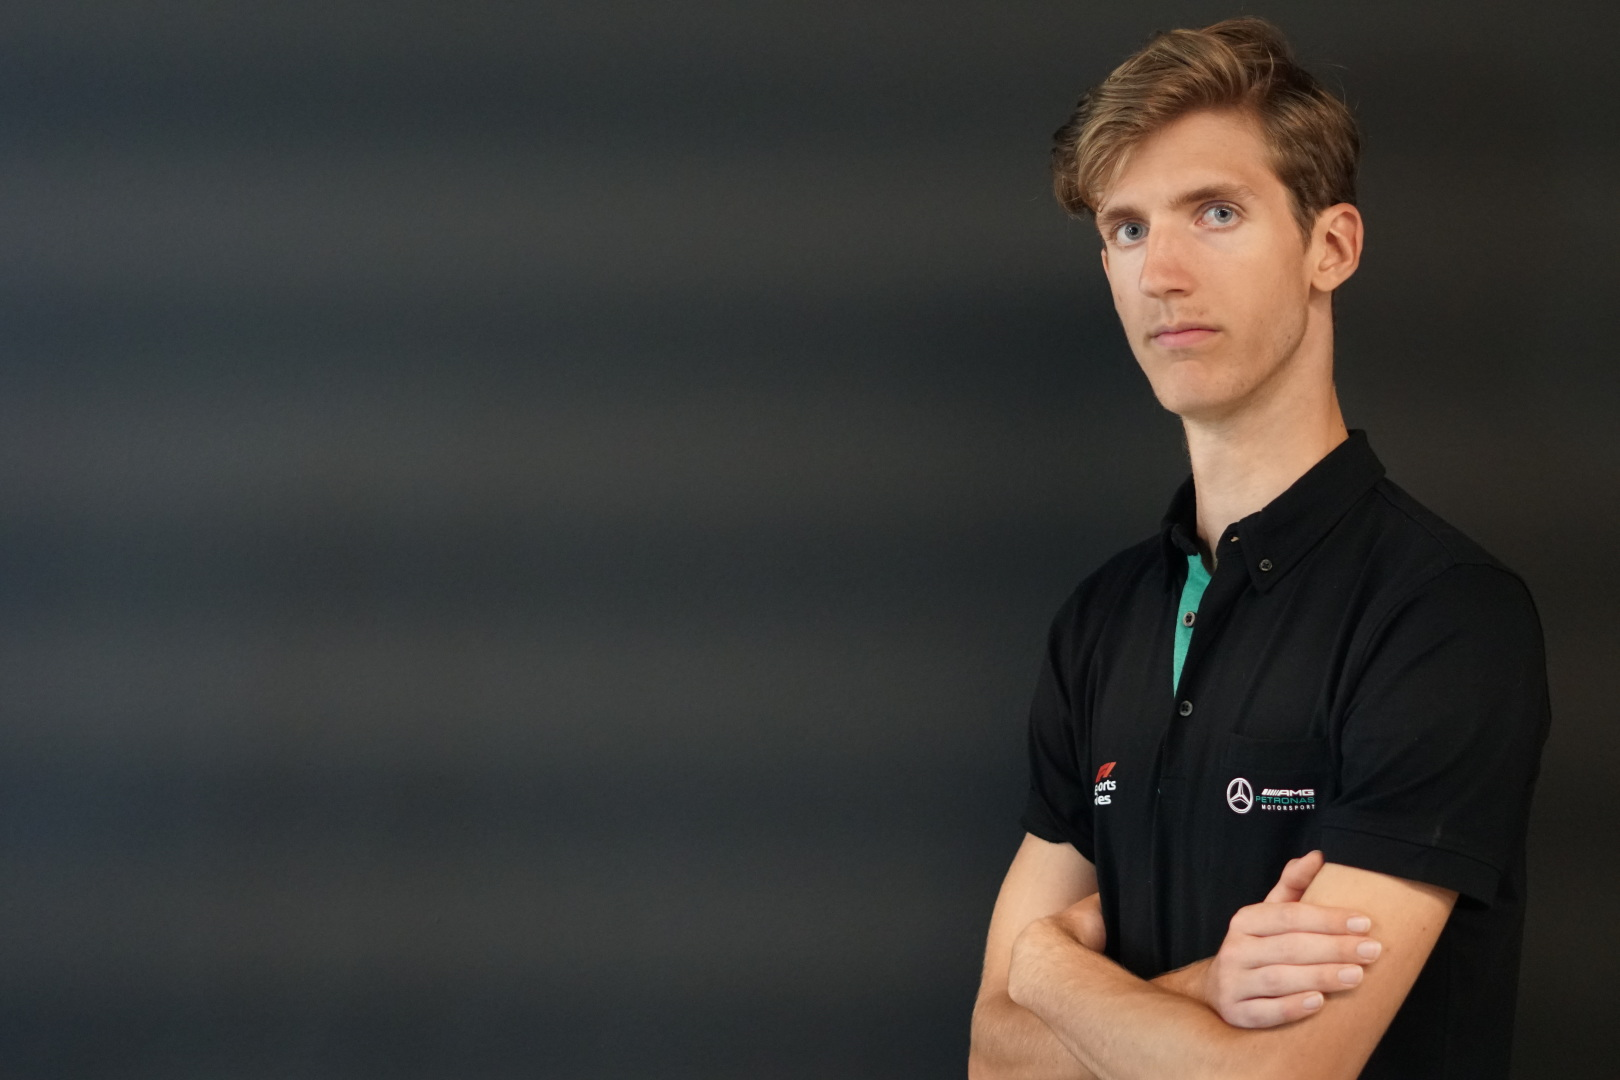 Bereznay Dani, Bereznay Dániel, racingline, racingline.hu, racinglinehu